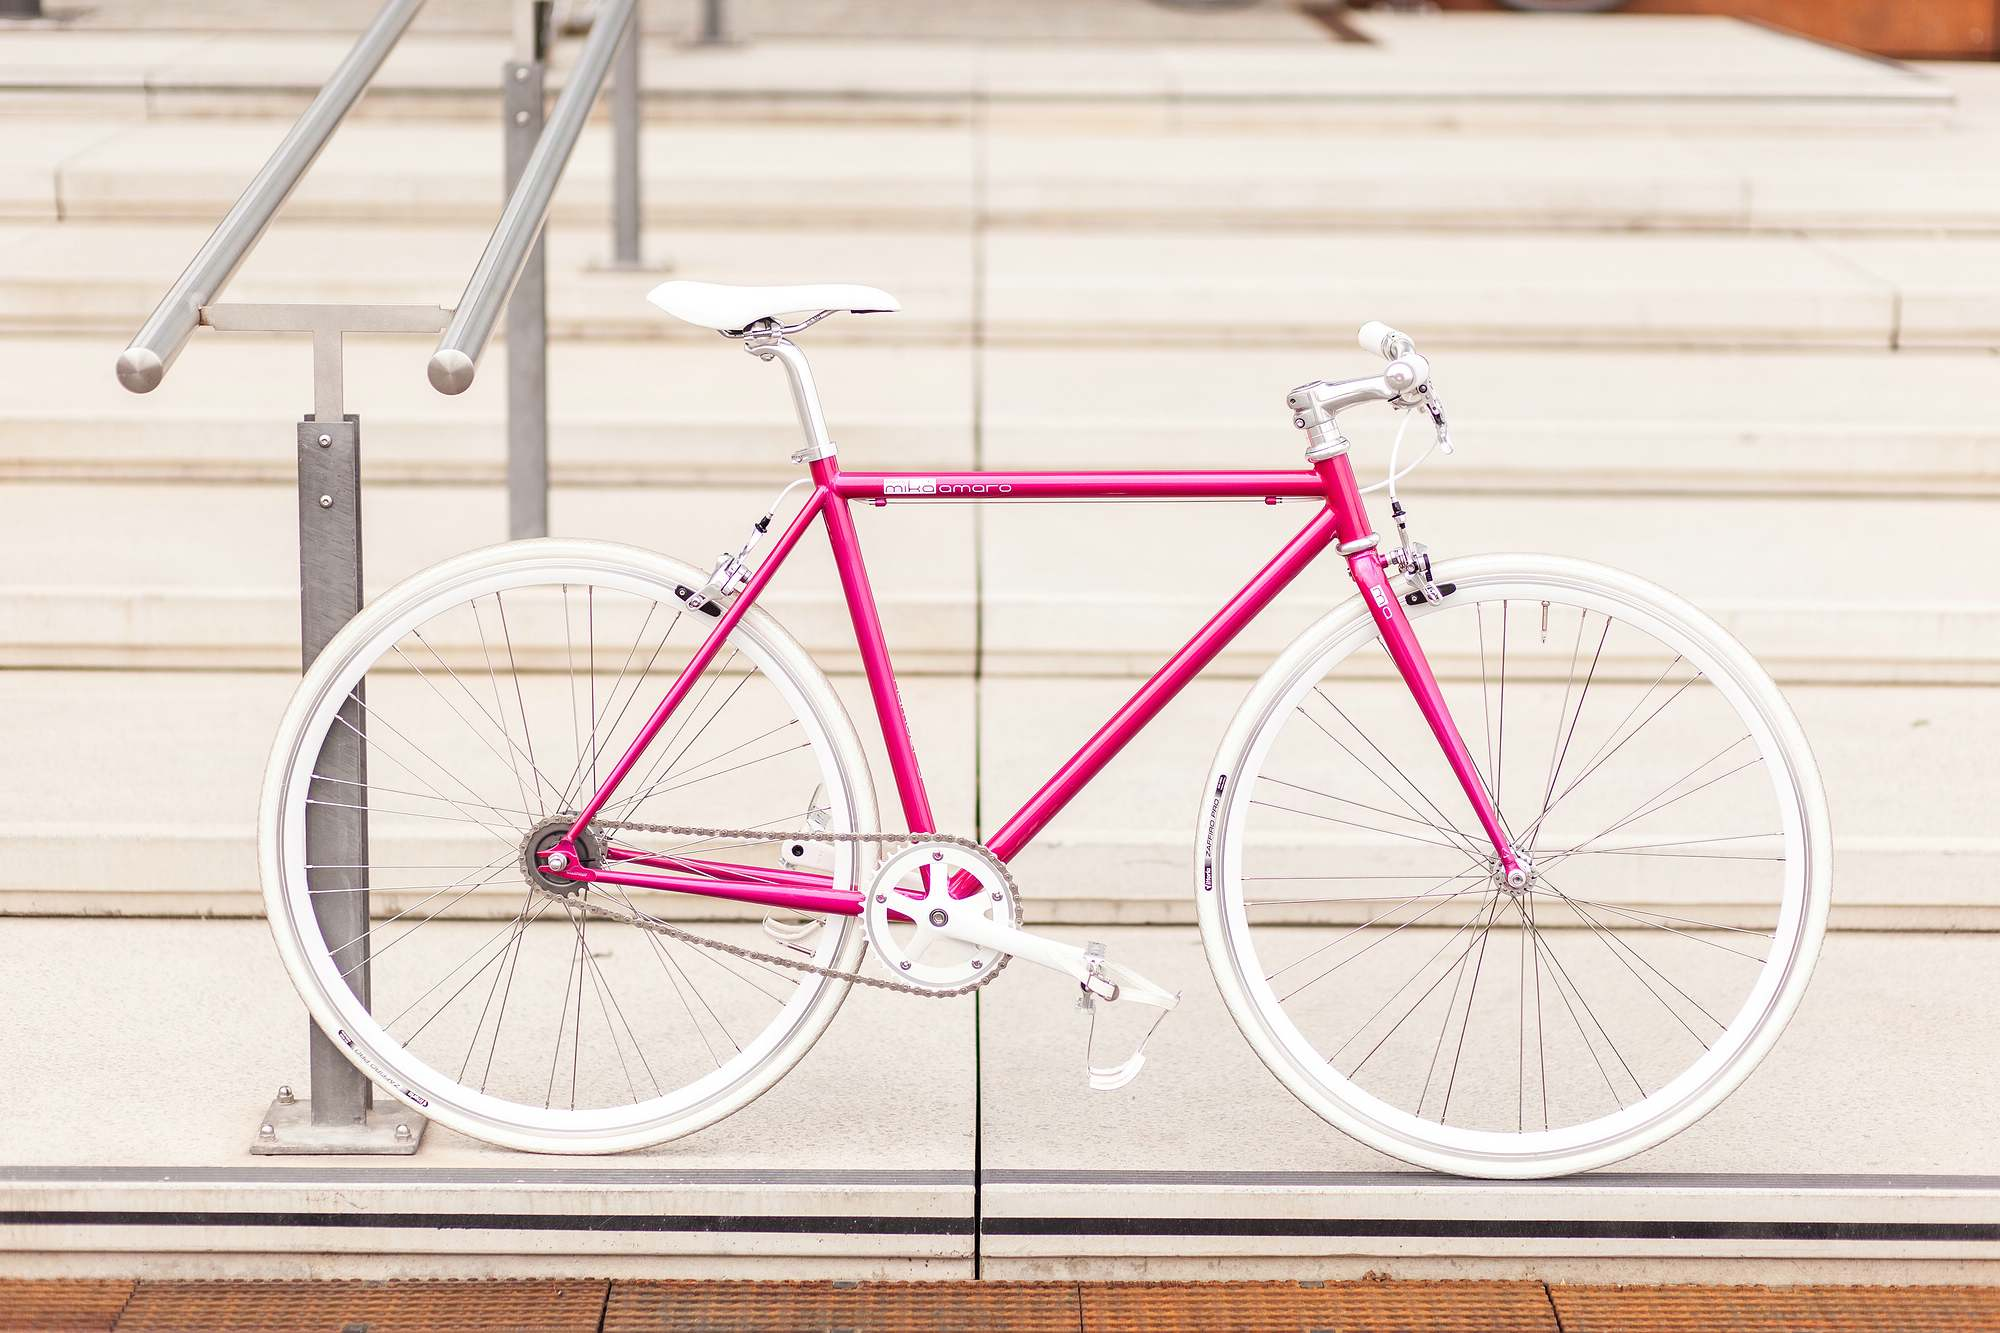 2 Speed Bike dressy pink, Automatix